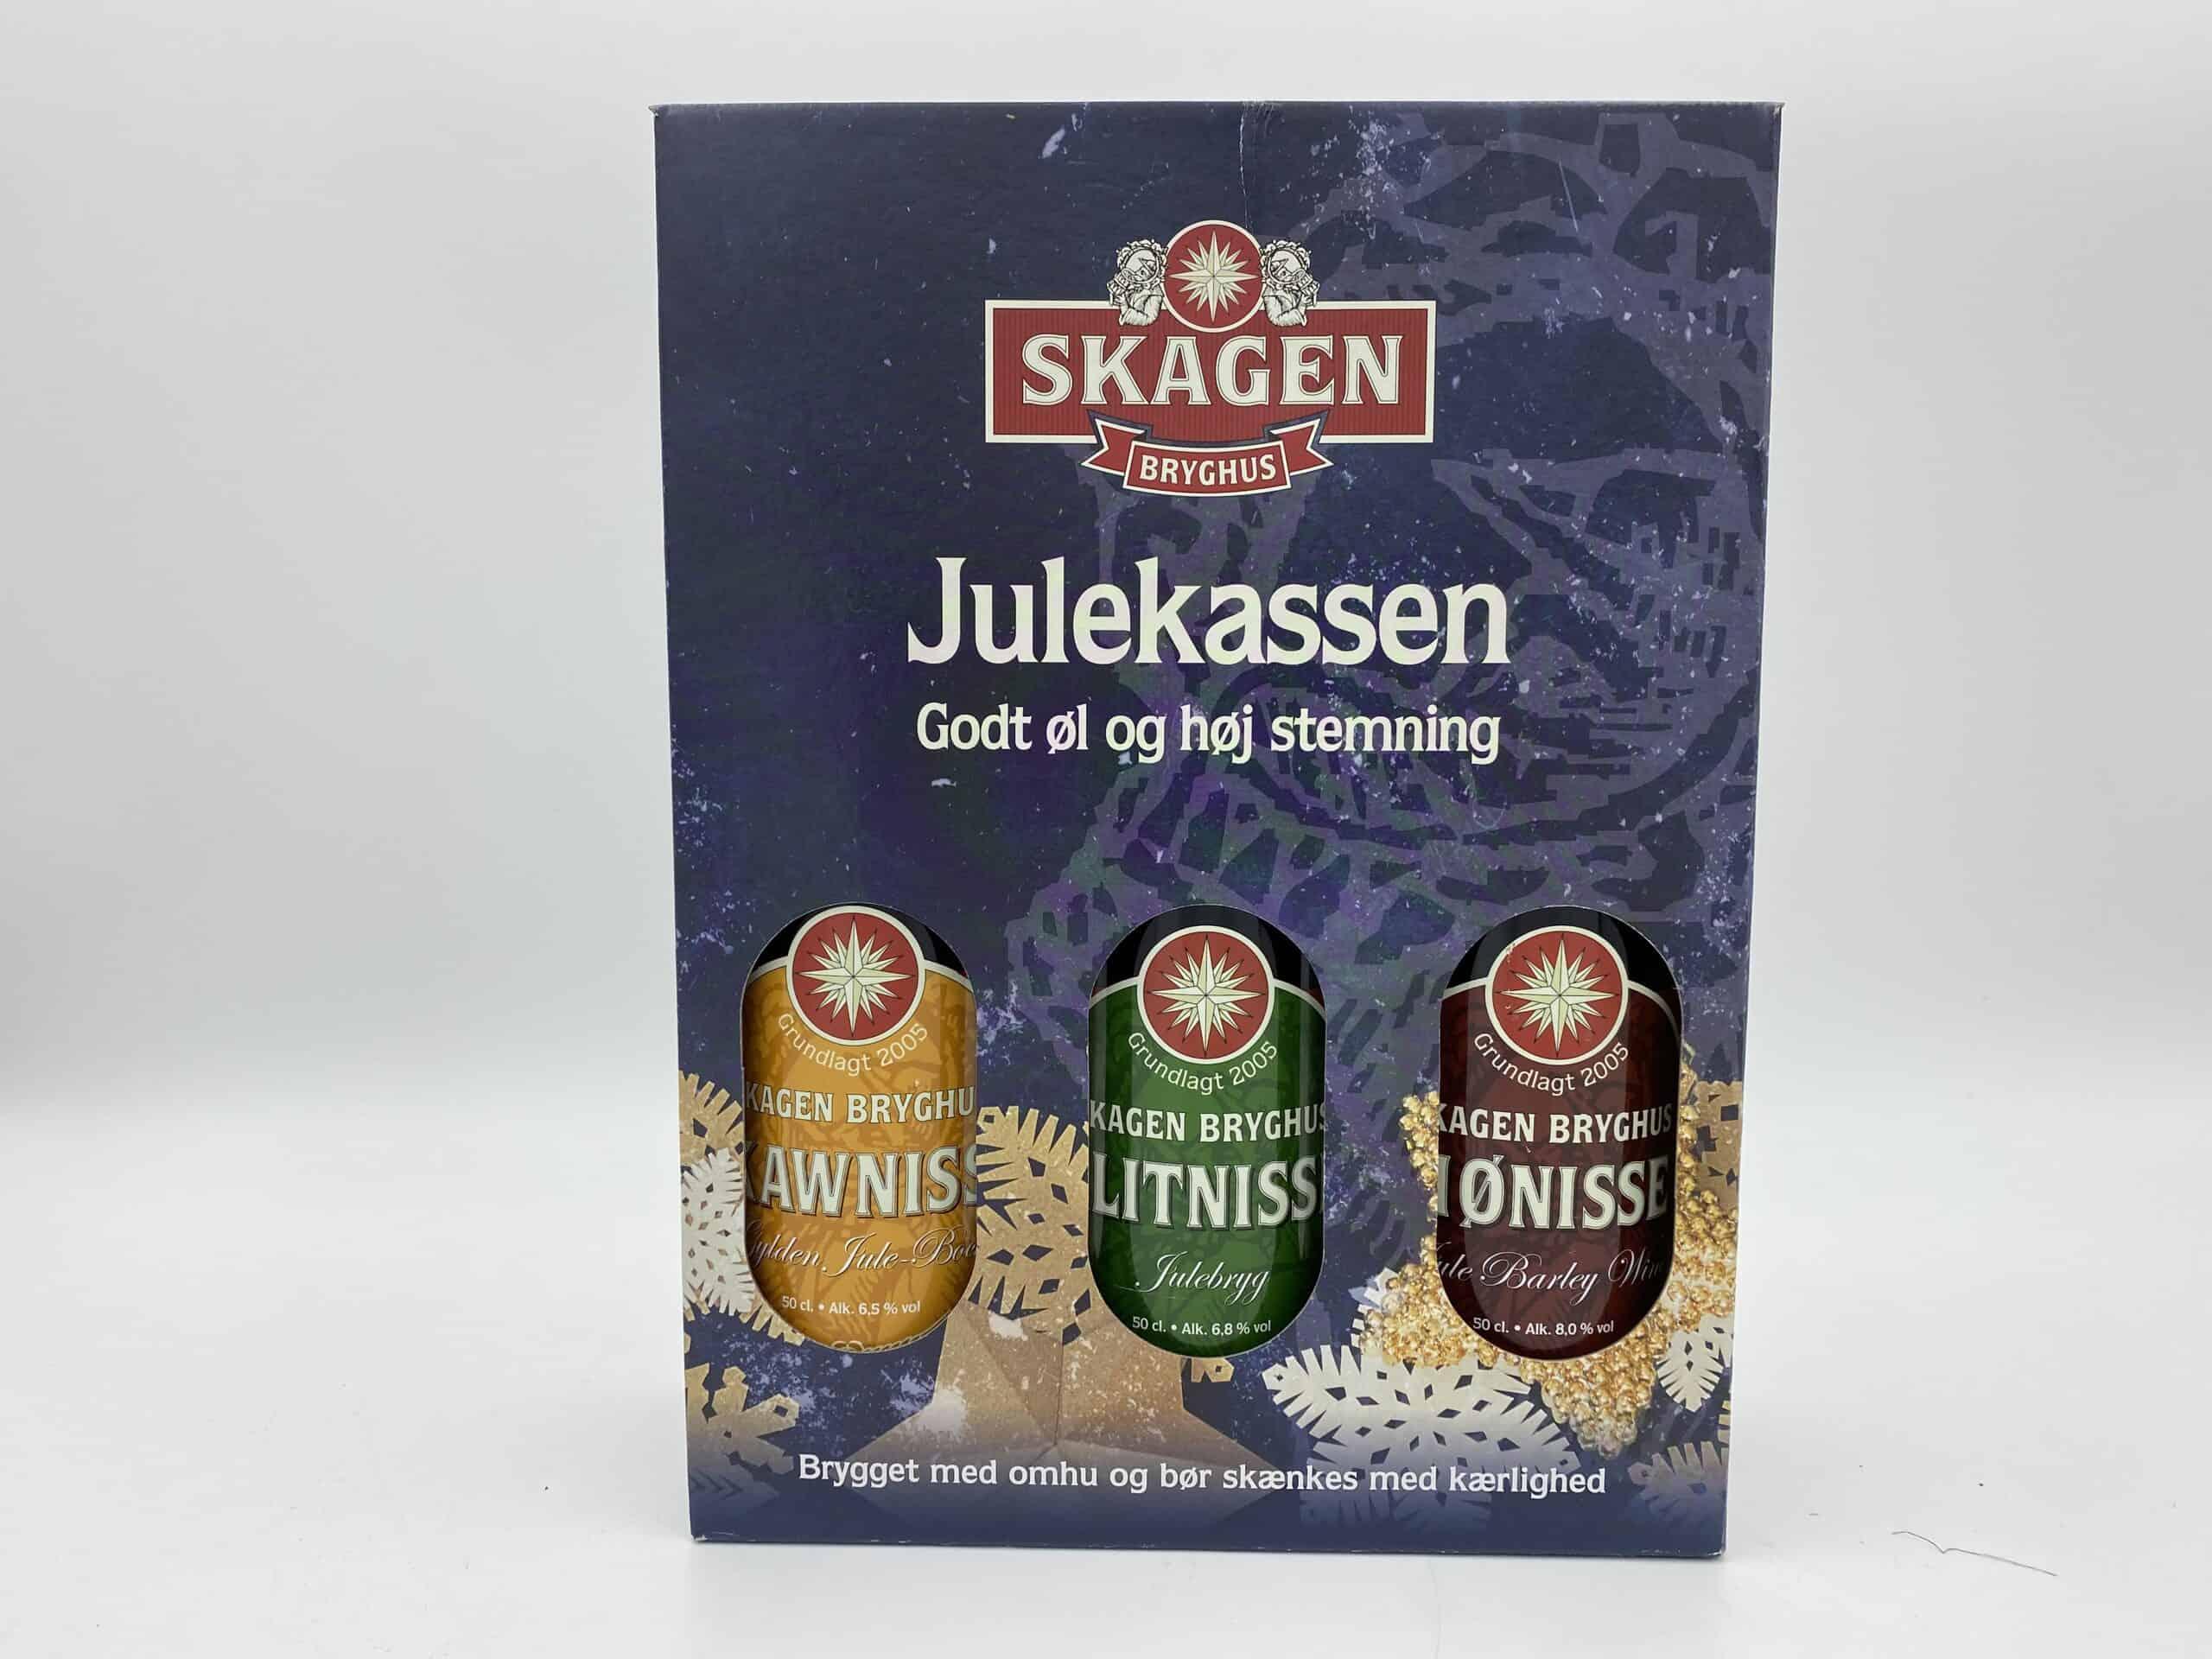 Julegavekasse m/ 3 Skagen Bryghus øl